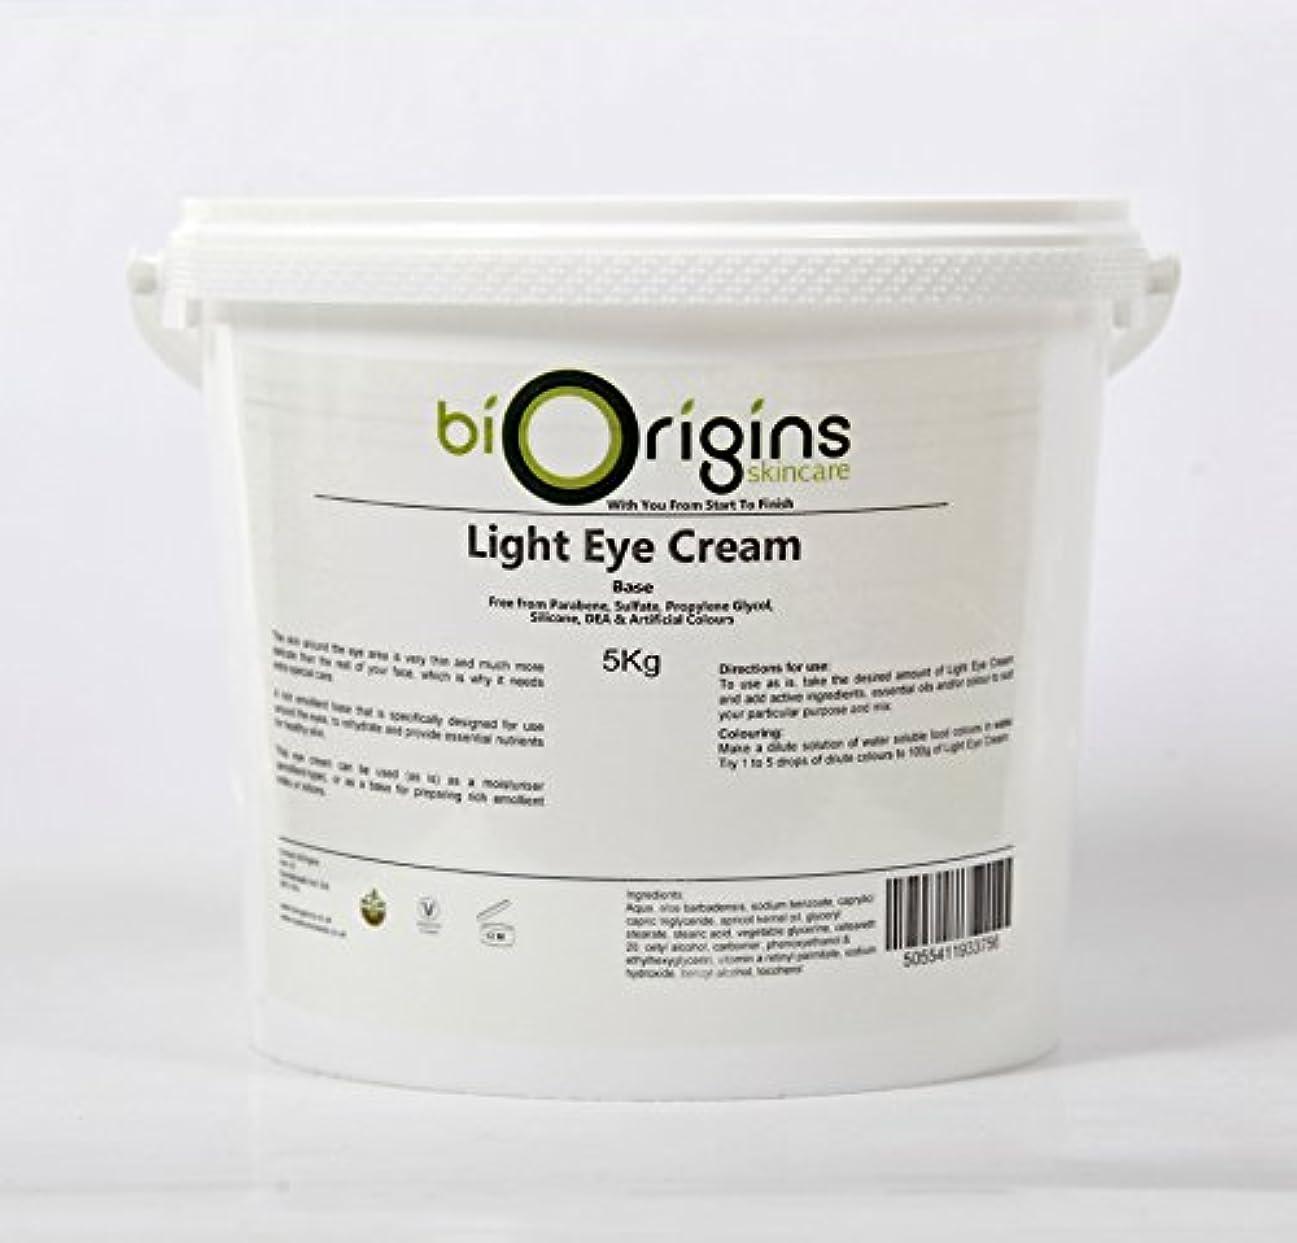 Light Eye Cream - Botanical Skincare Base - 5Kg